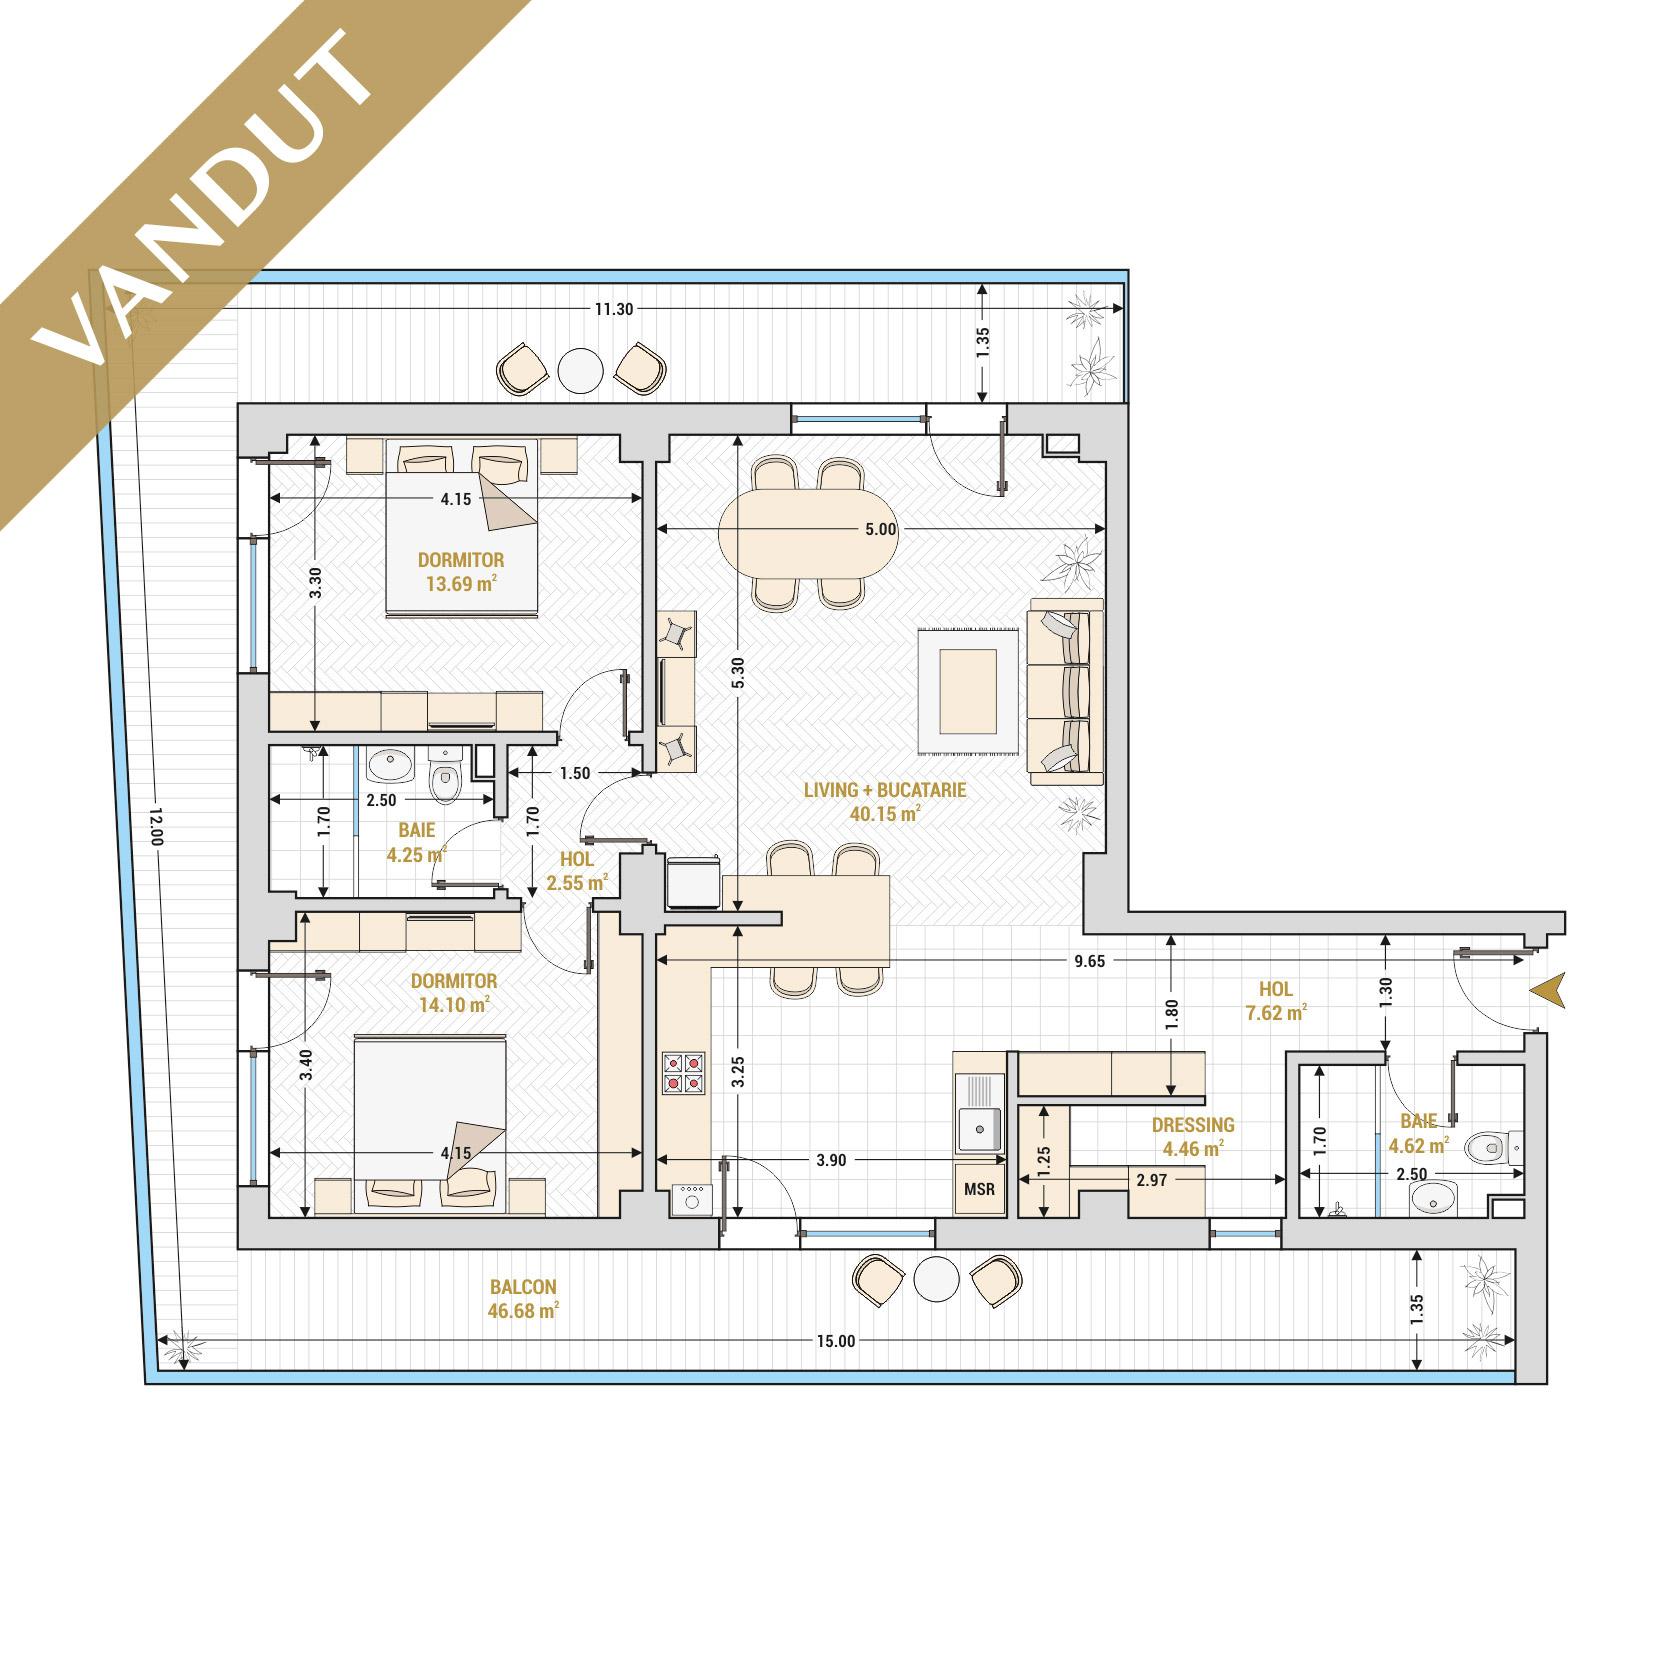 Apartamente cu 3 camere de vanzare Bucuresti - Catedral Residence - Marriott, Piata Unirii, 13 Septembrie, Izvor - Tip 1 - T1A